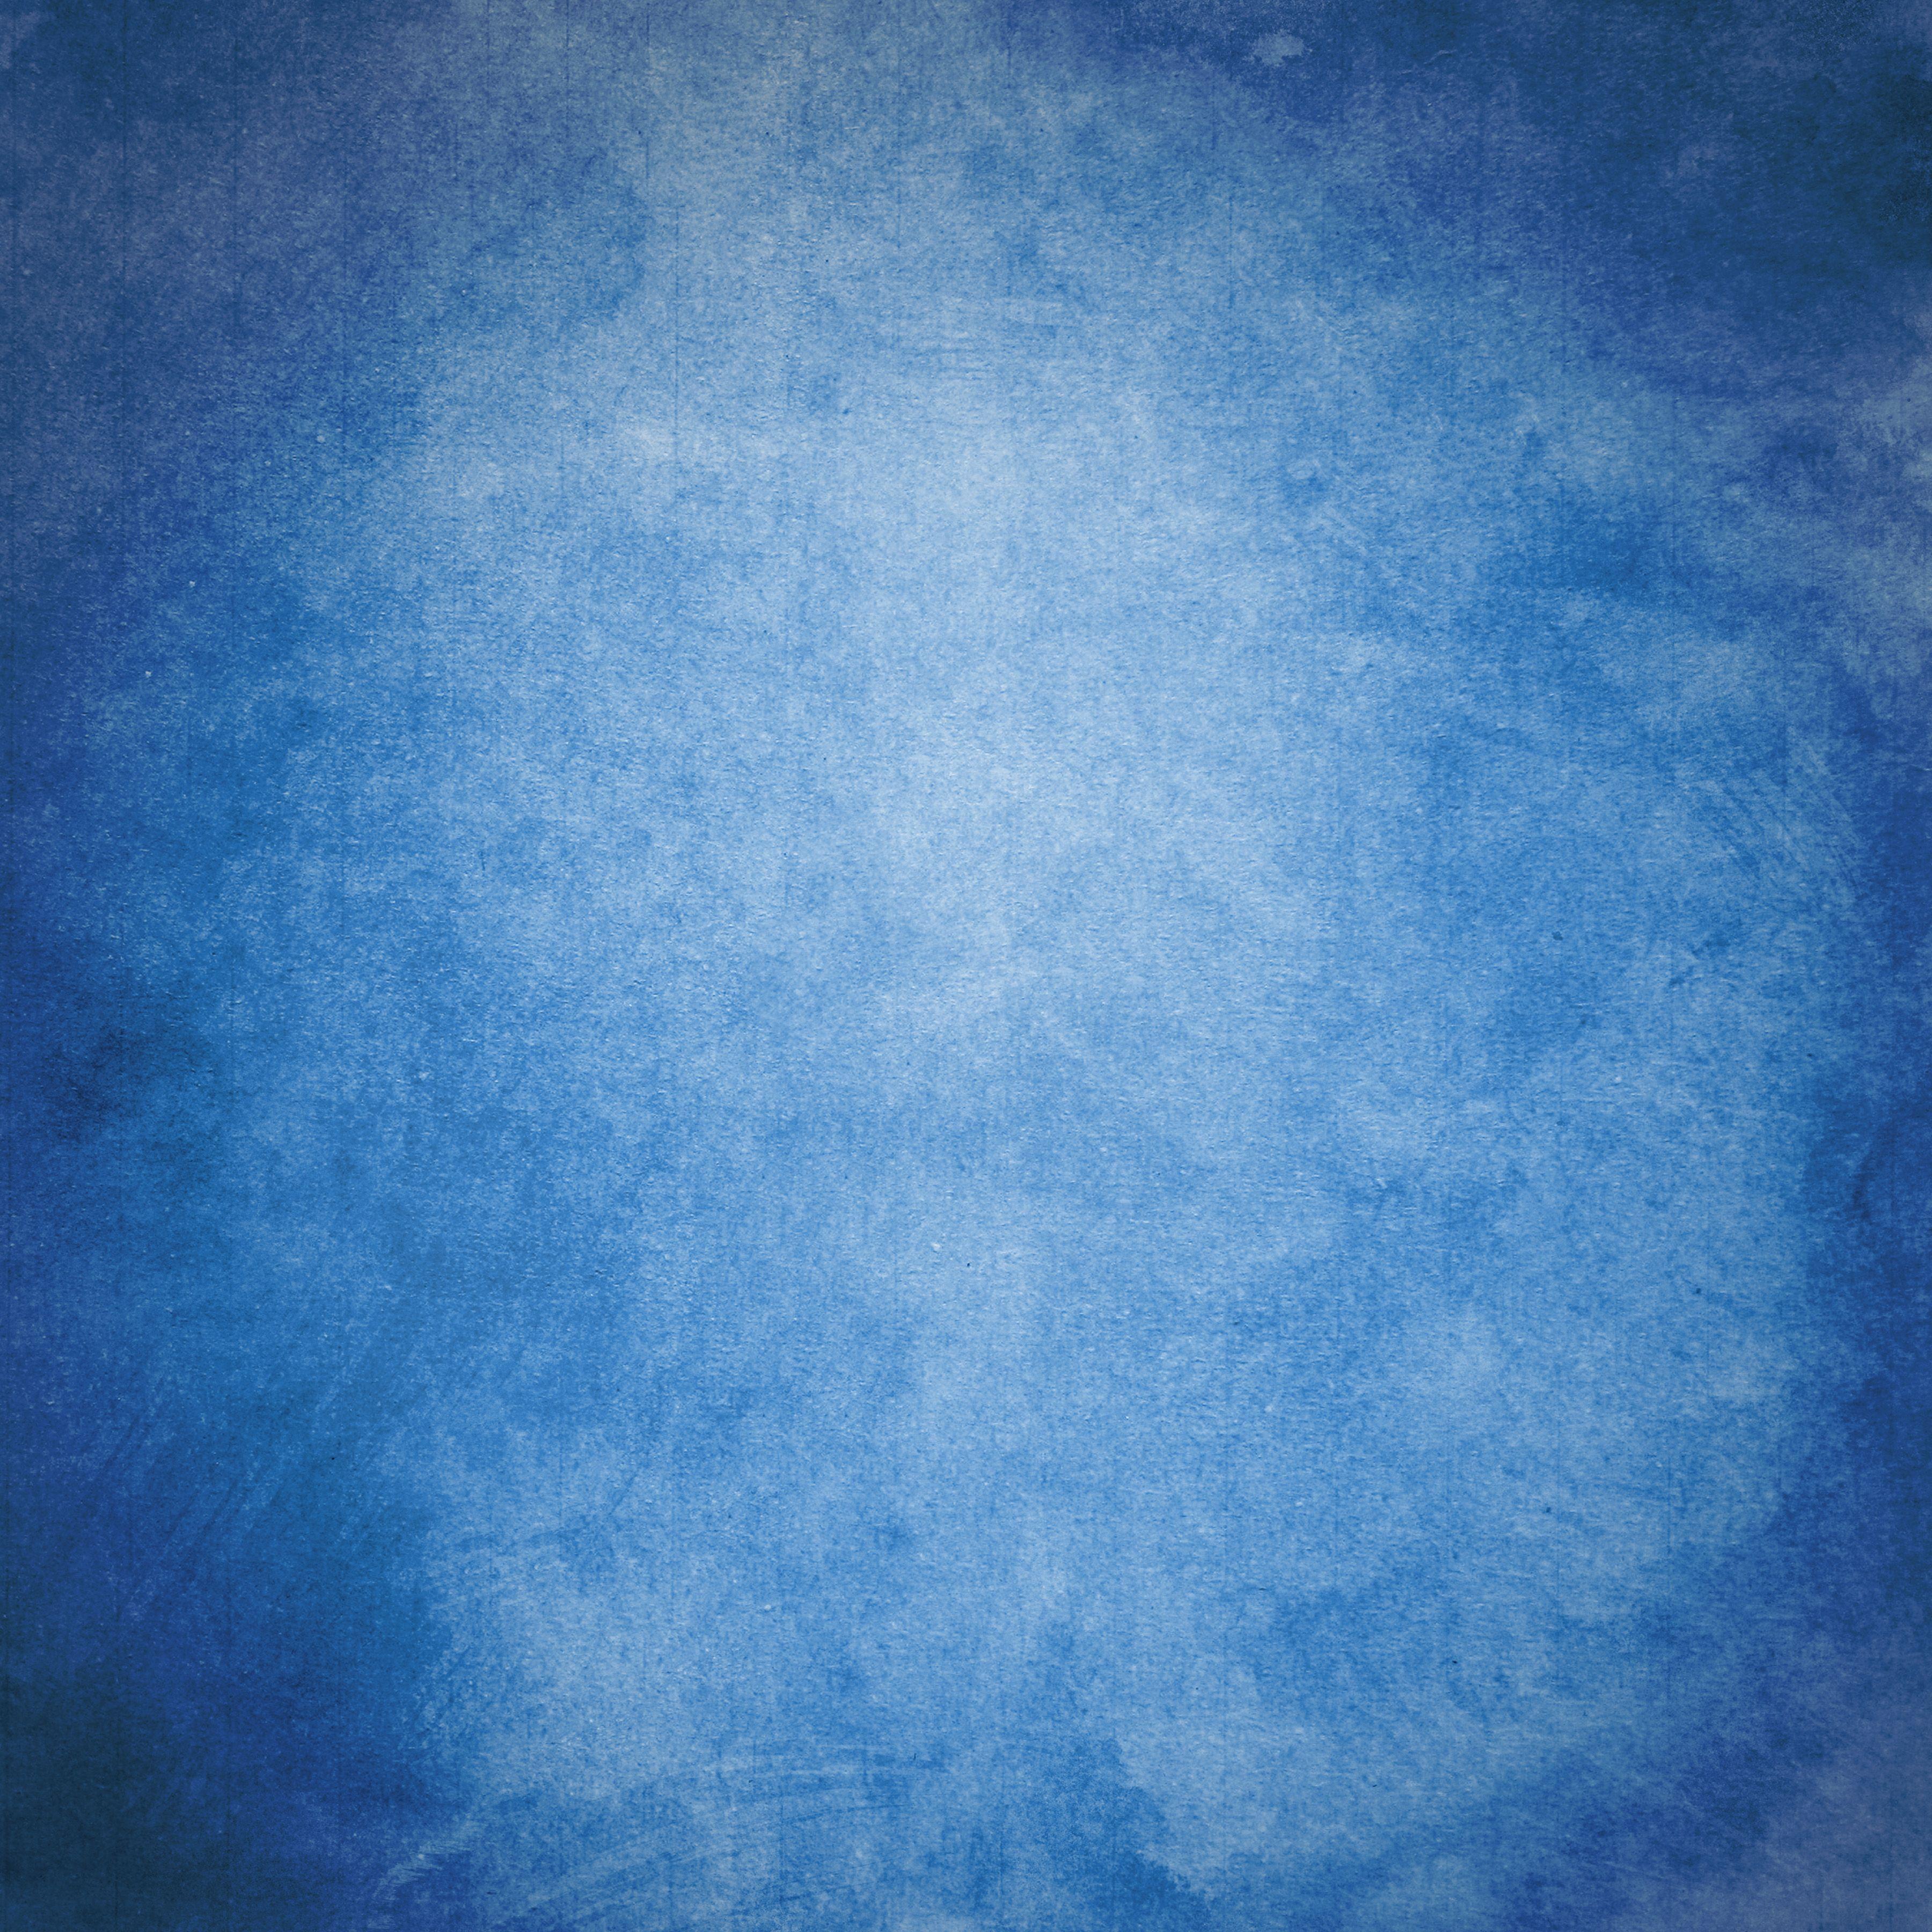 blue texture pack